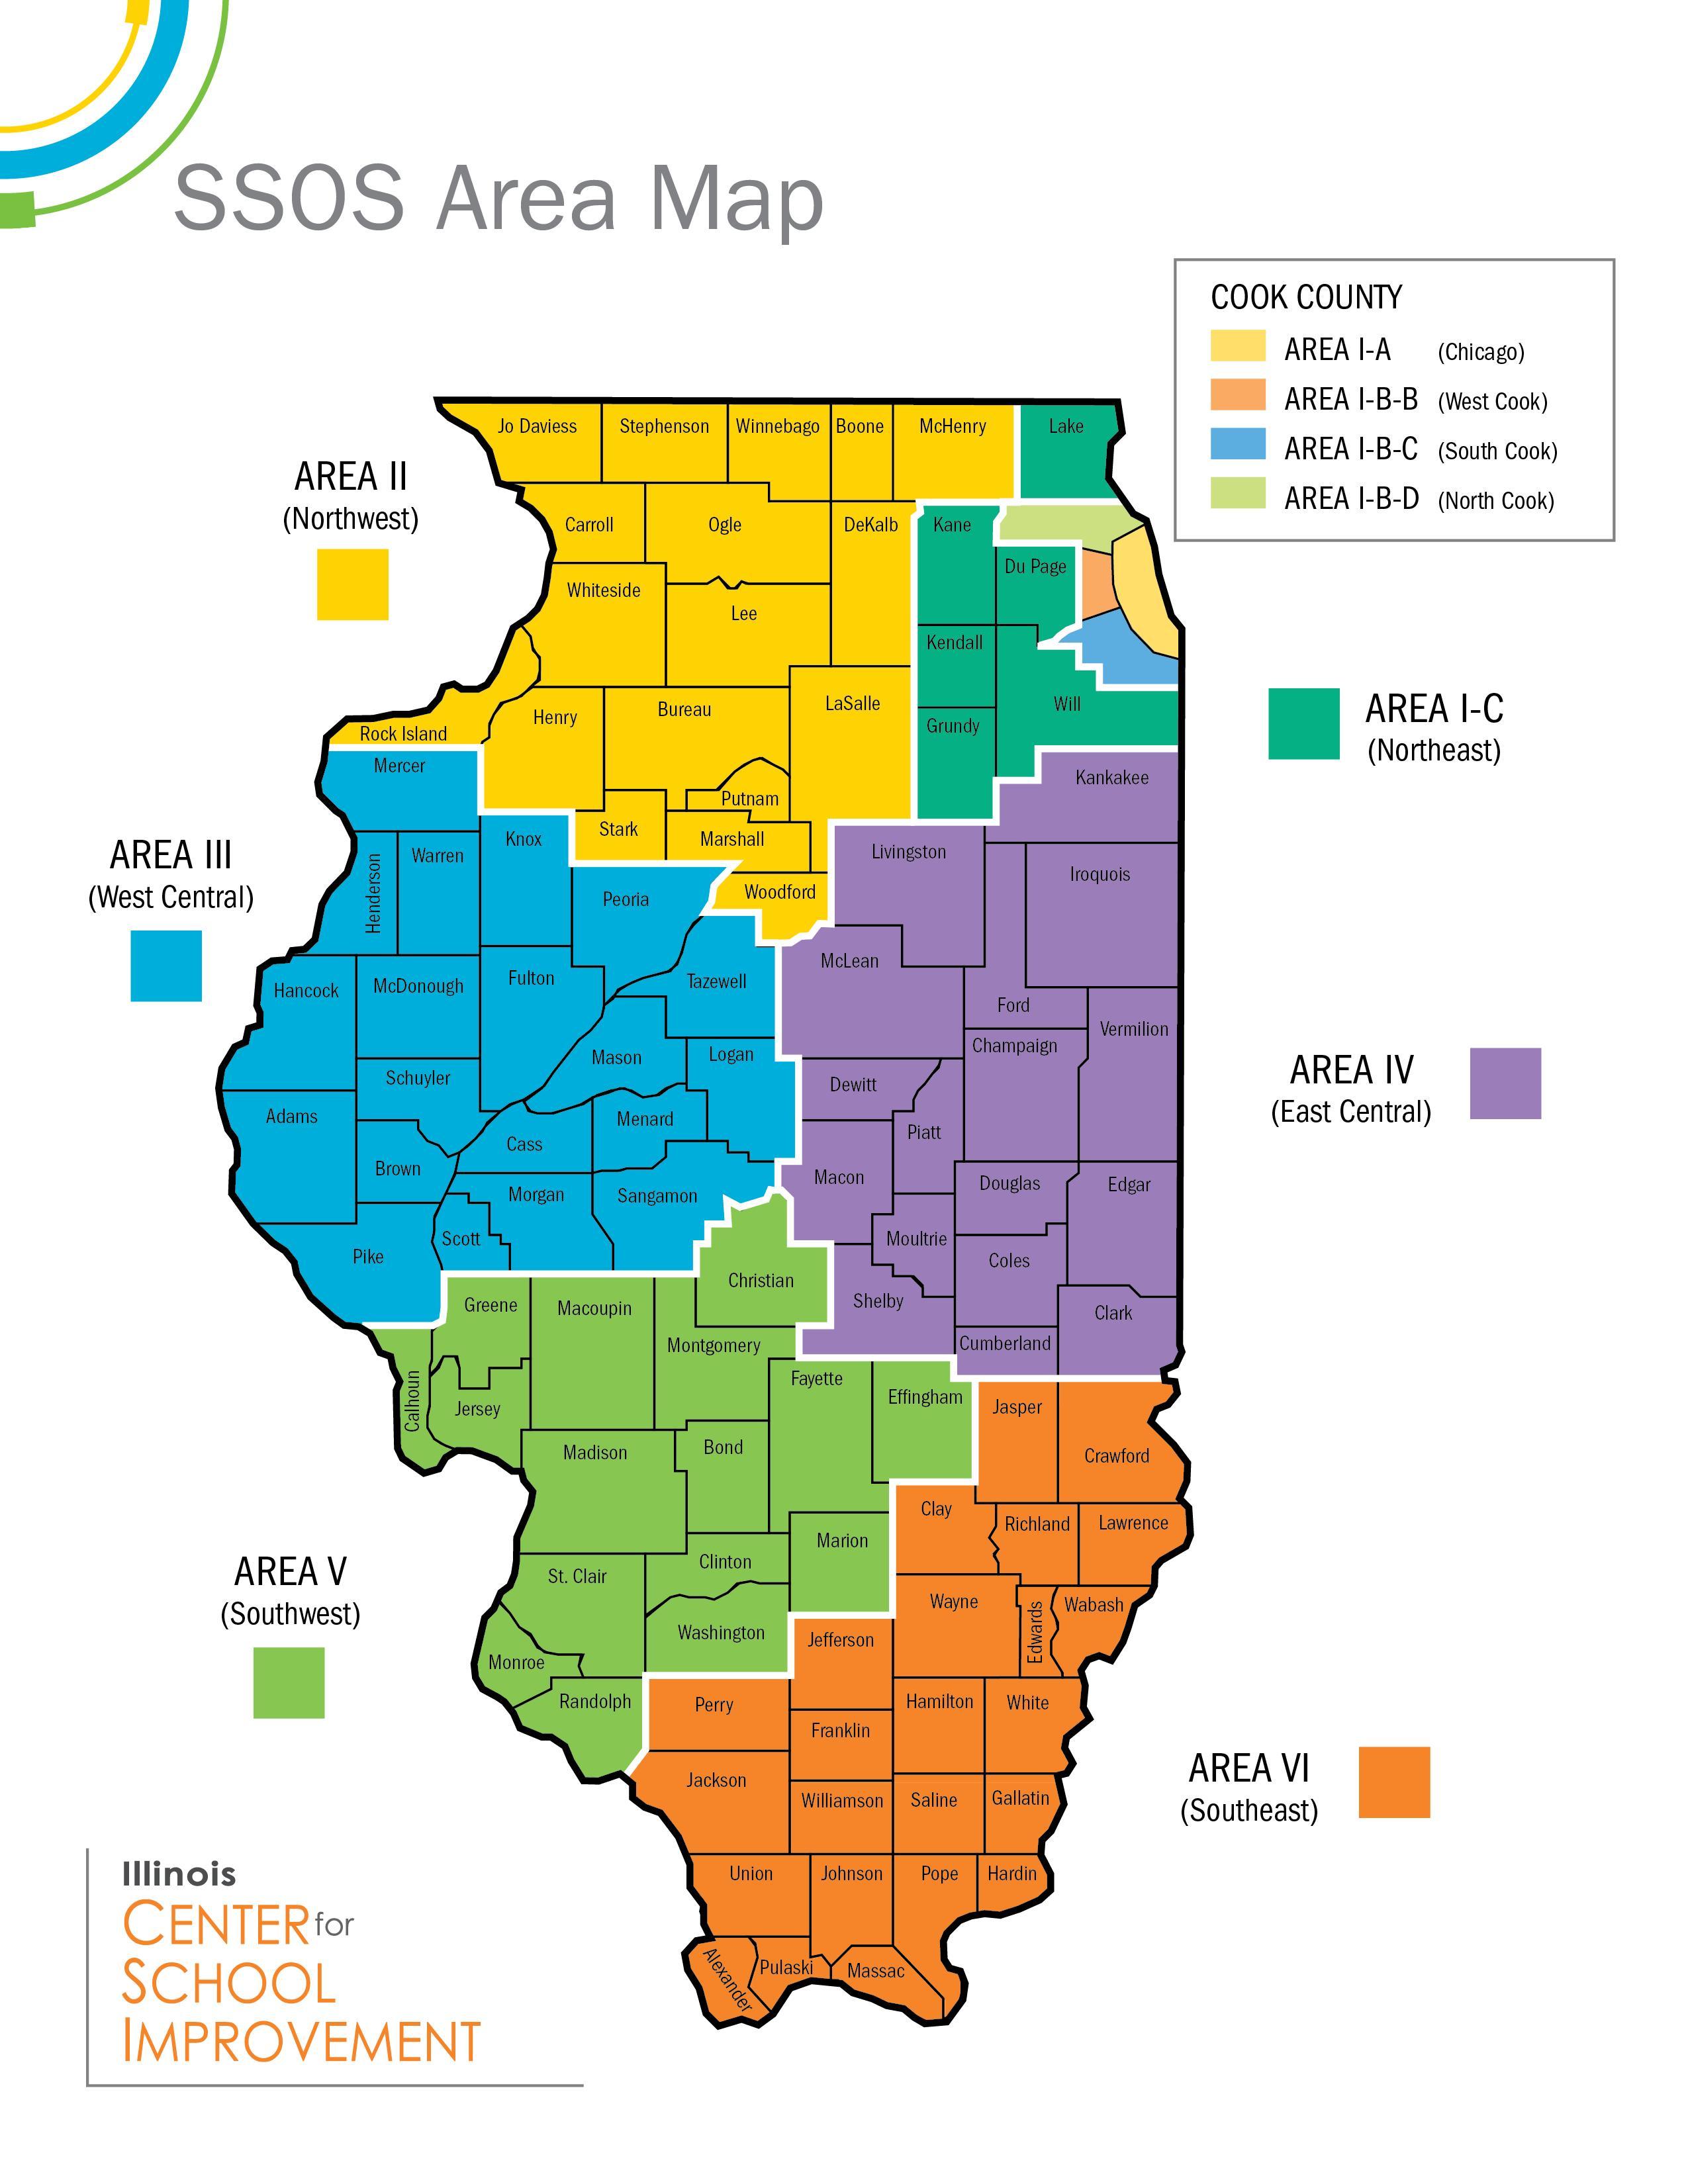 Karta Usa Chicago.Chicago School District Karta Chicago Offentliga Skolor Karta Usa